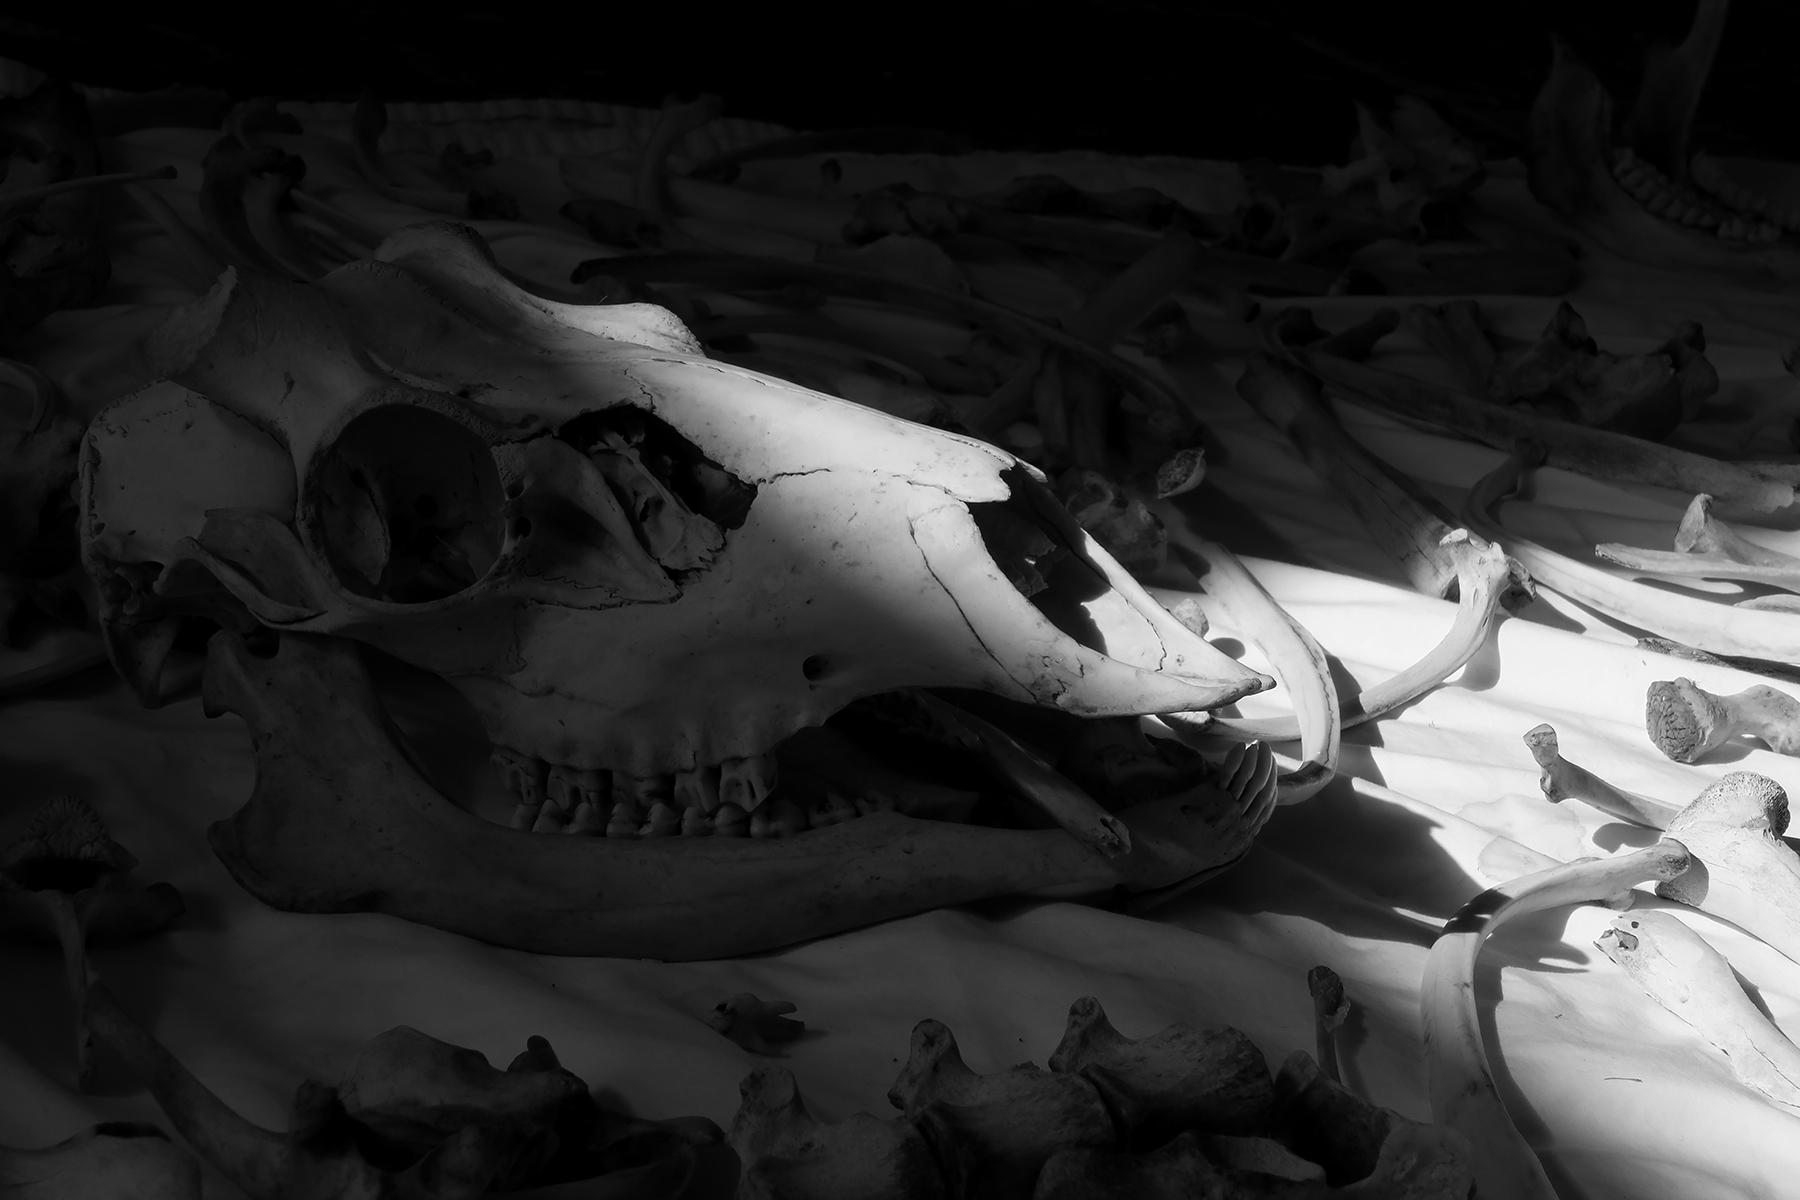 Skull and Bones 6, 2019 Venice Biennale, Kathryn Hart